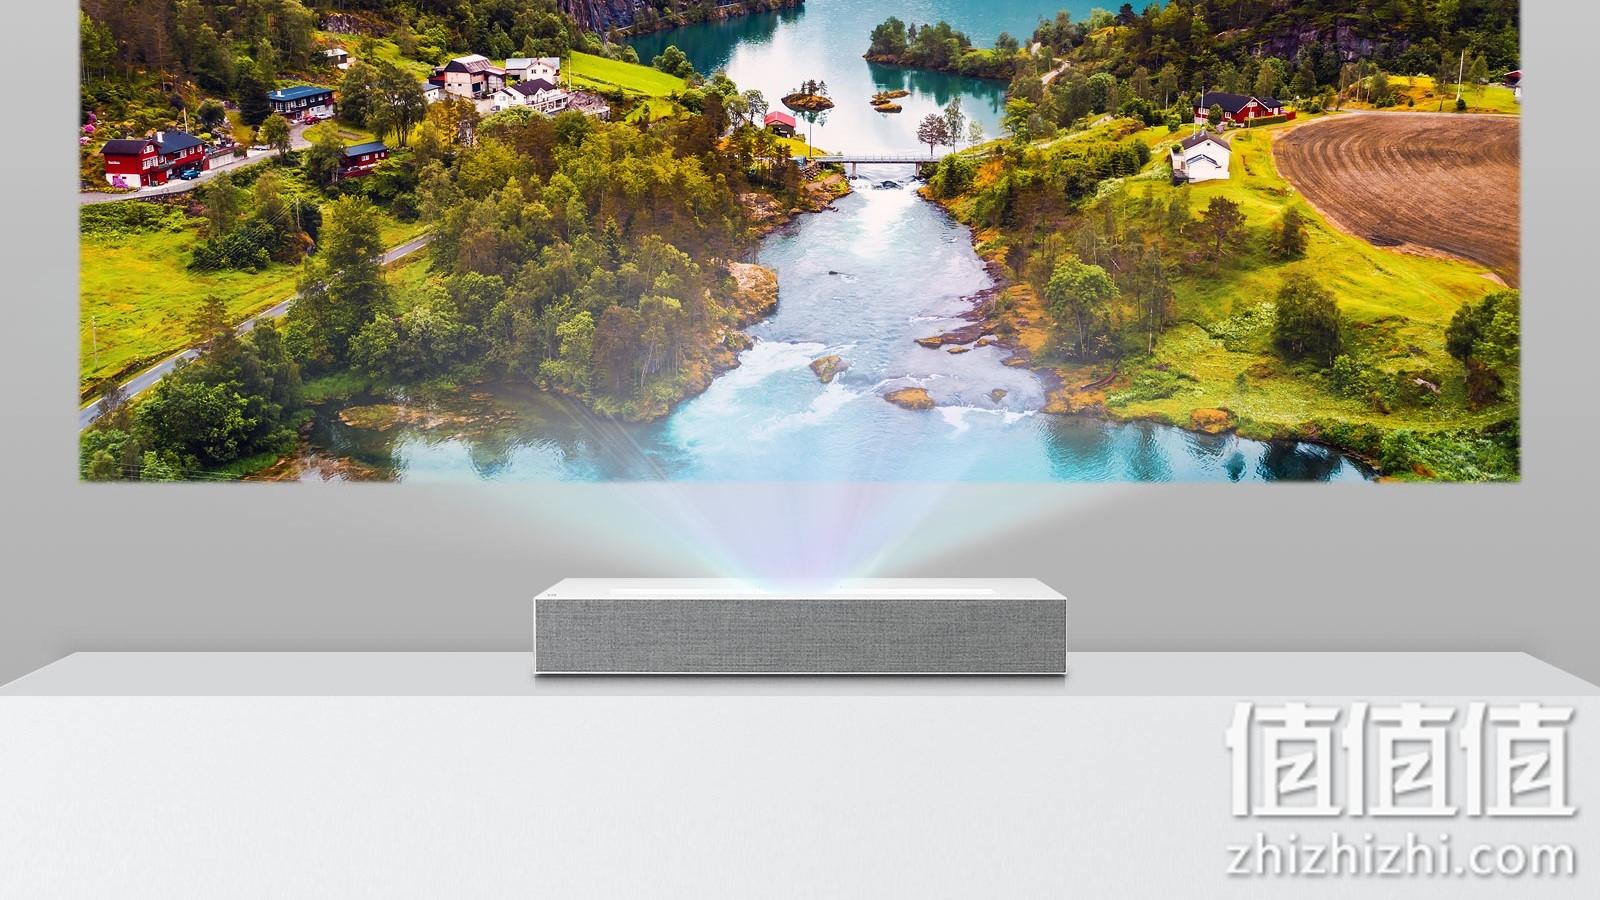 LG CineBeam HU85LA 家庭影院超短焦投影仪